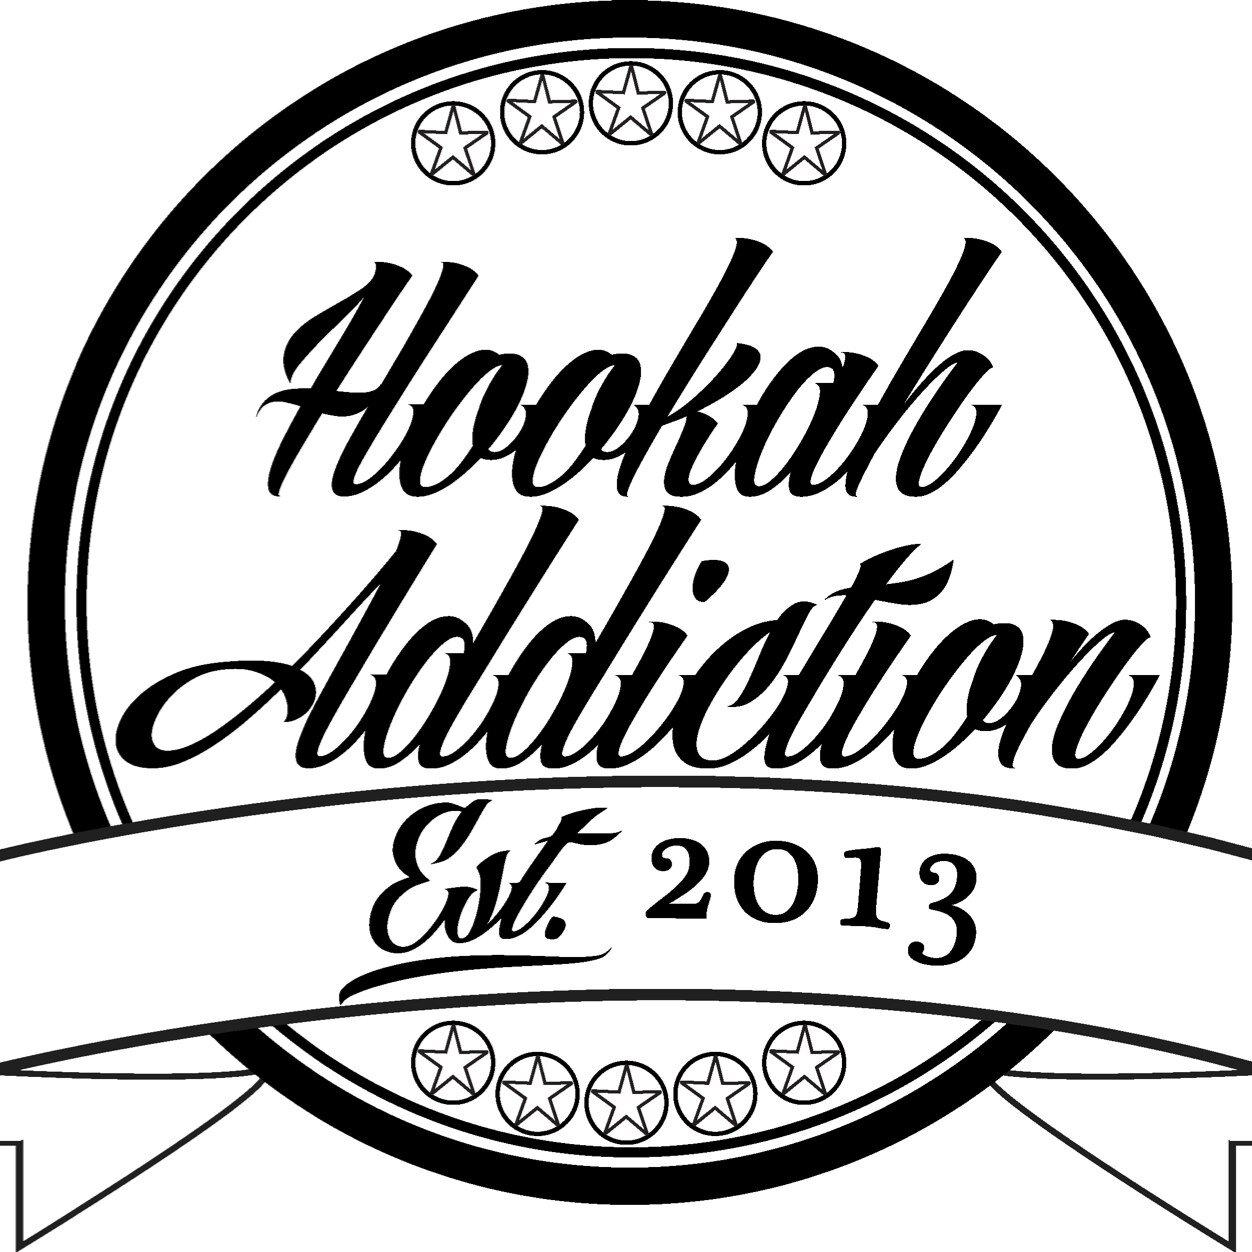 1252x1252 Hookah Addiction (@hookahaddictig) Twitter